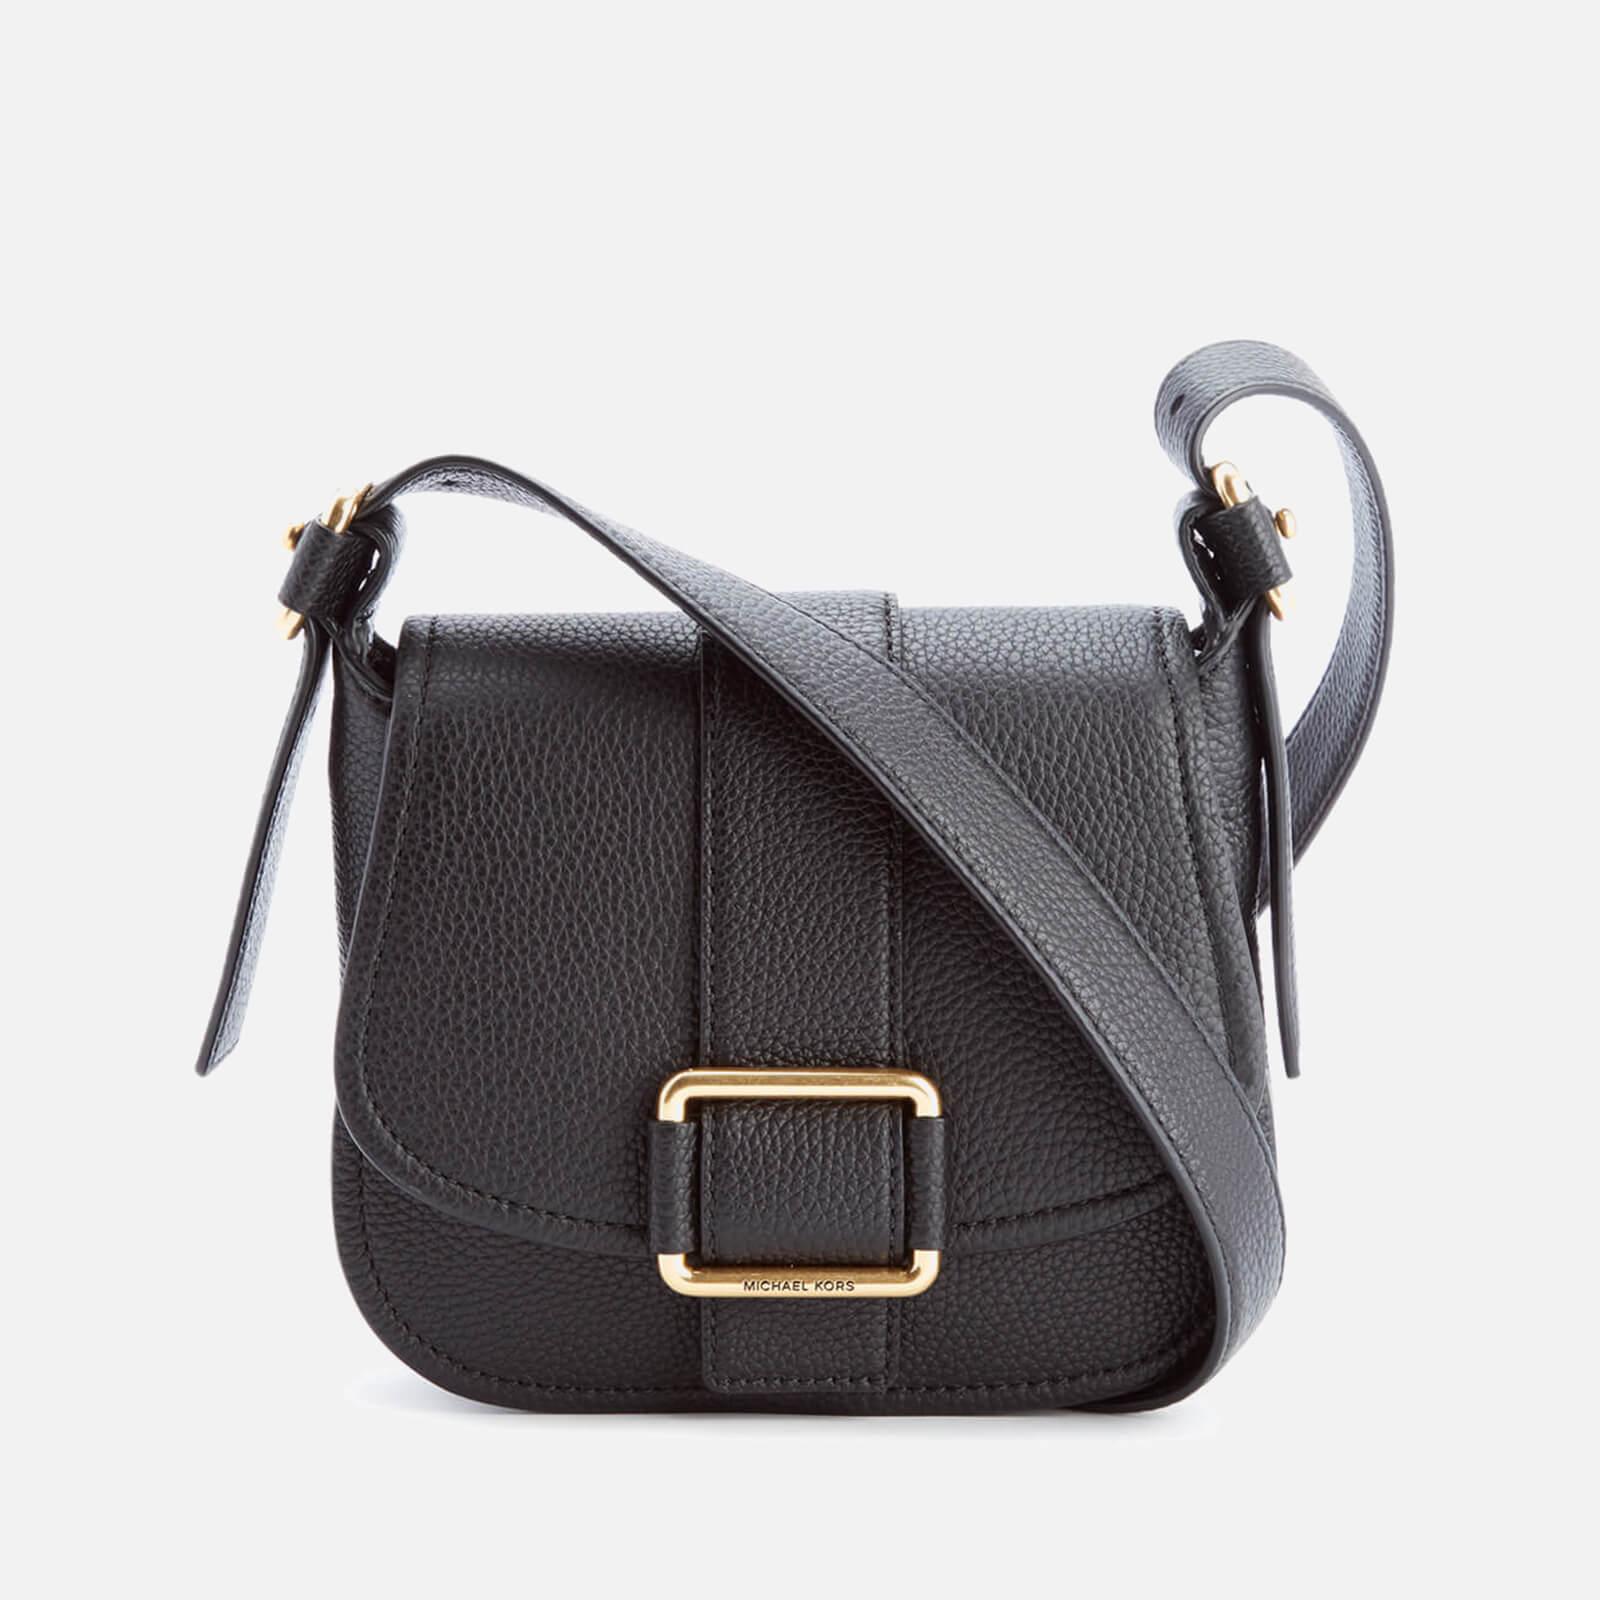 2d38a8e1 MICHAEL MICHAEL KORS Women's Maxine Mid Saddle Bag - Black - Free UK  Delivery over £50